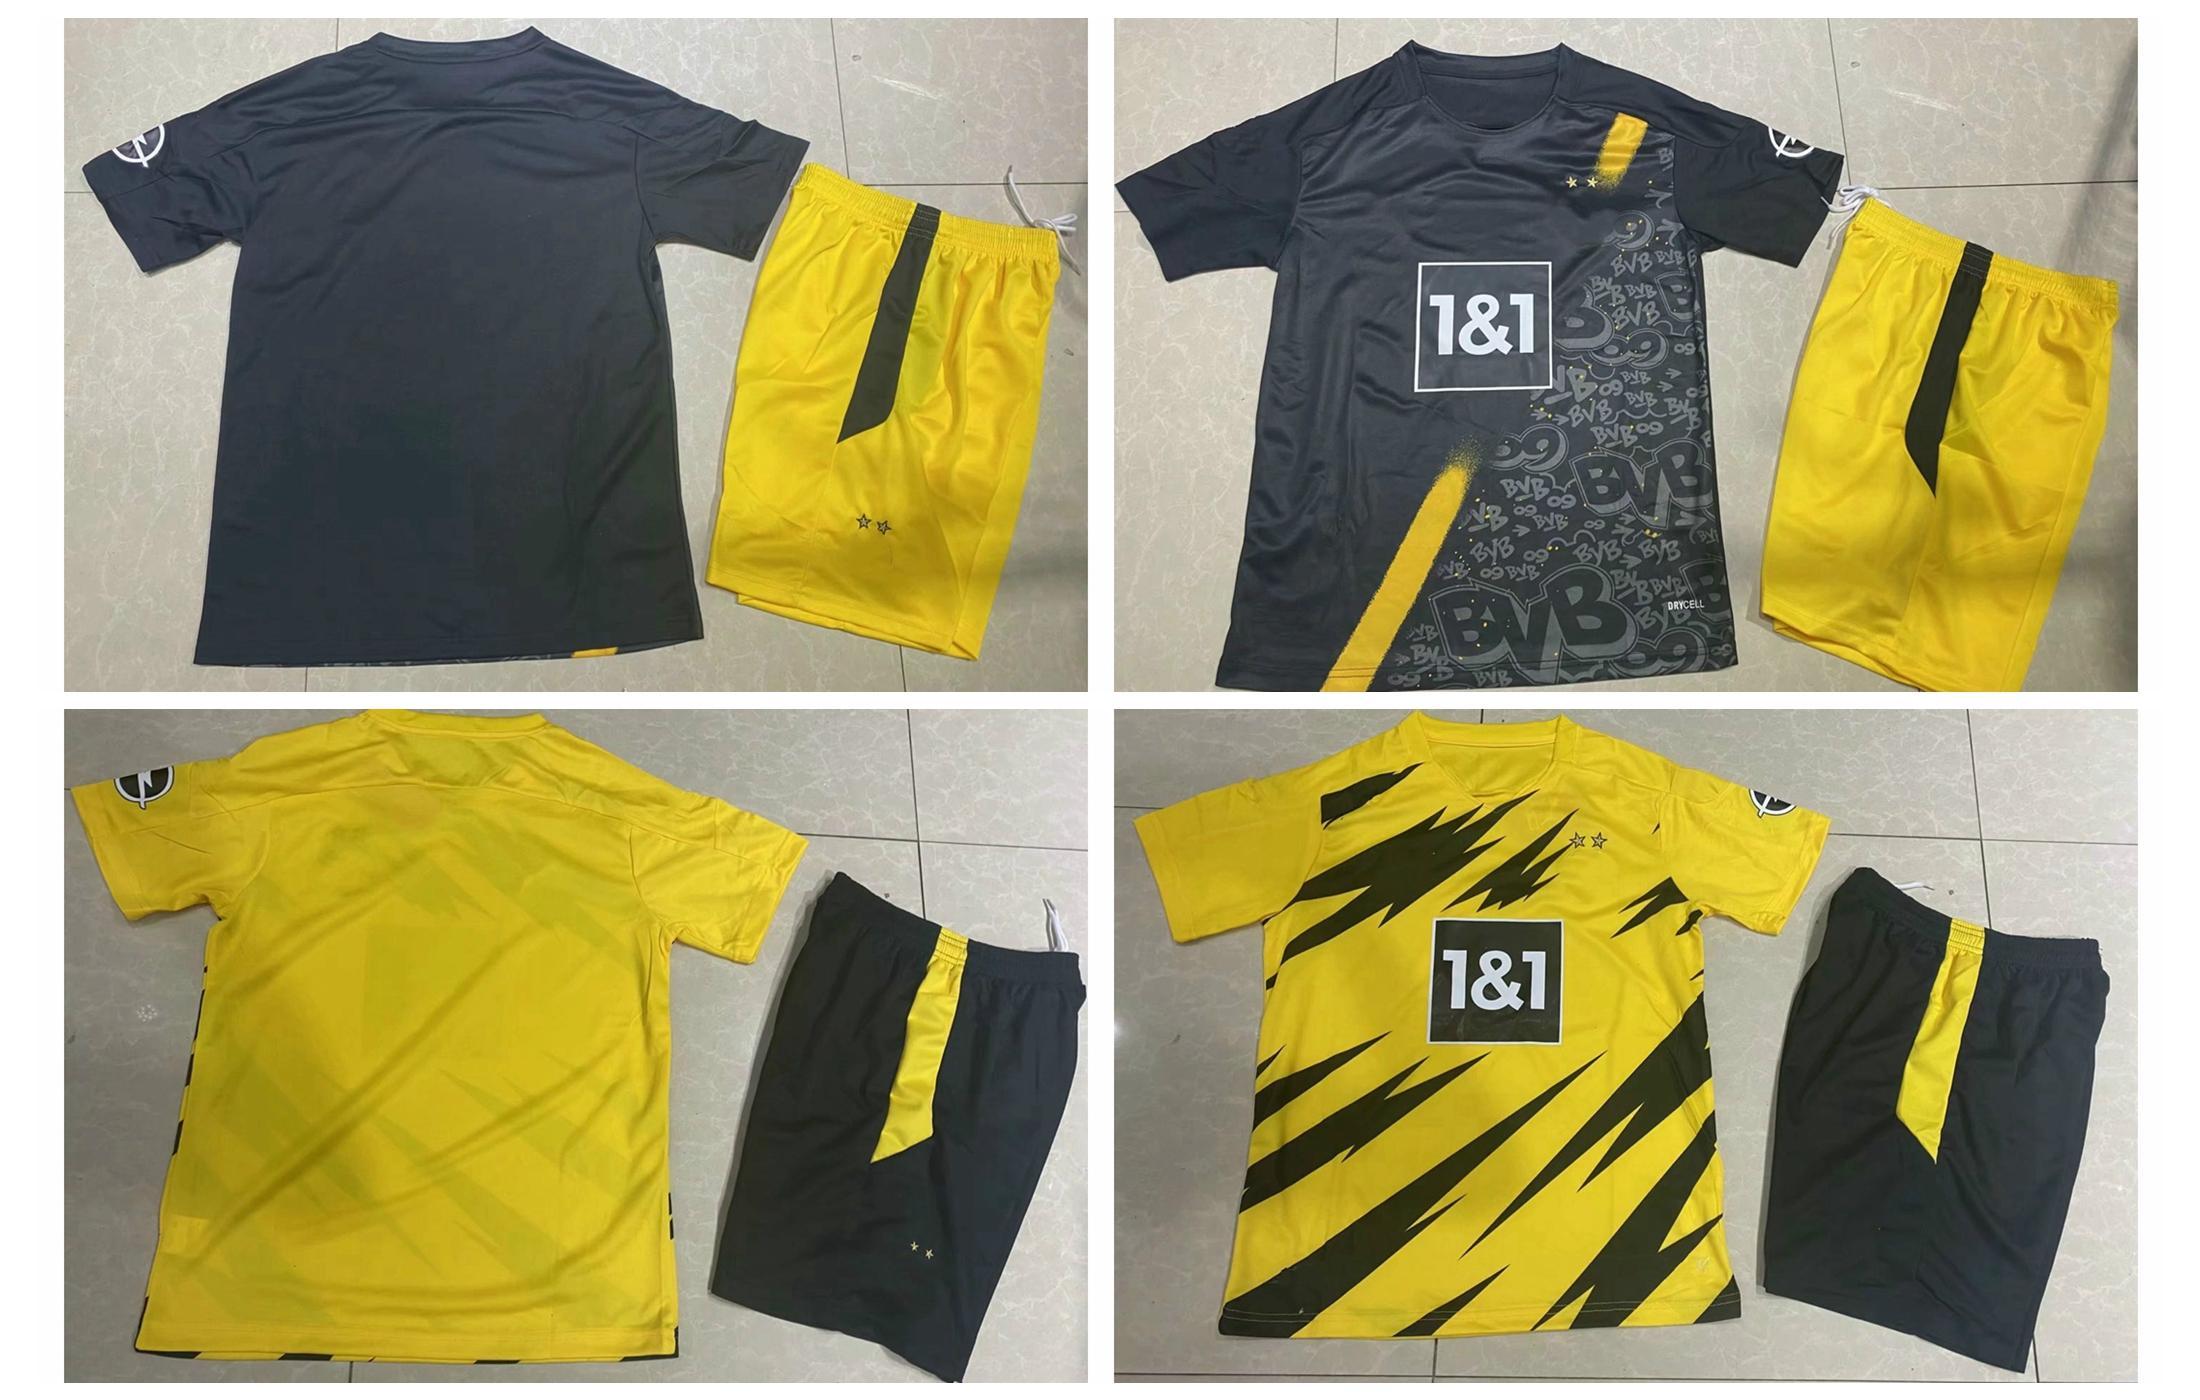 10 PIECE DHL FREE 2021 ADULT KIT 2020 CAMISETAS DE HAZARD REUS Haaland SANCHO MEN SETS uniform